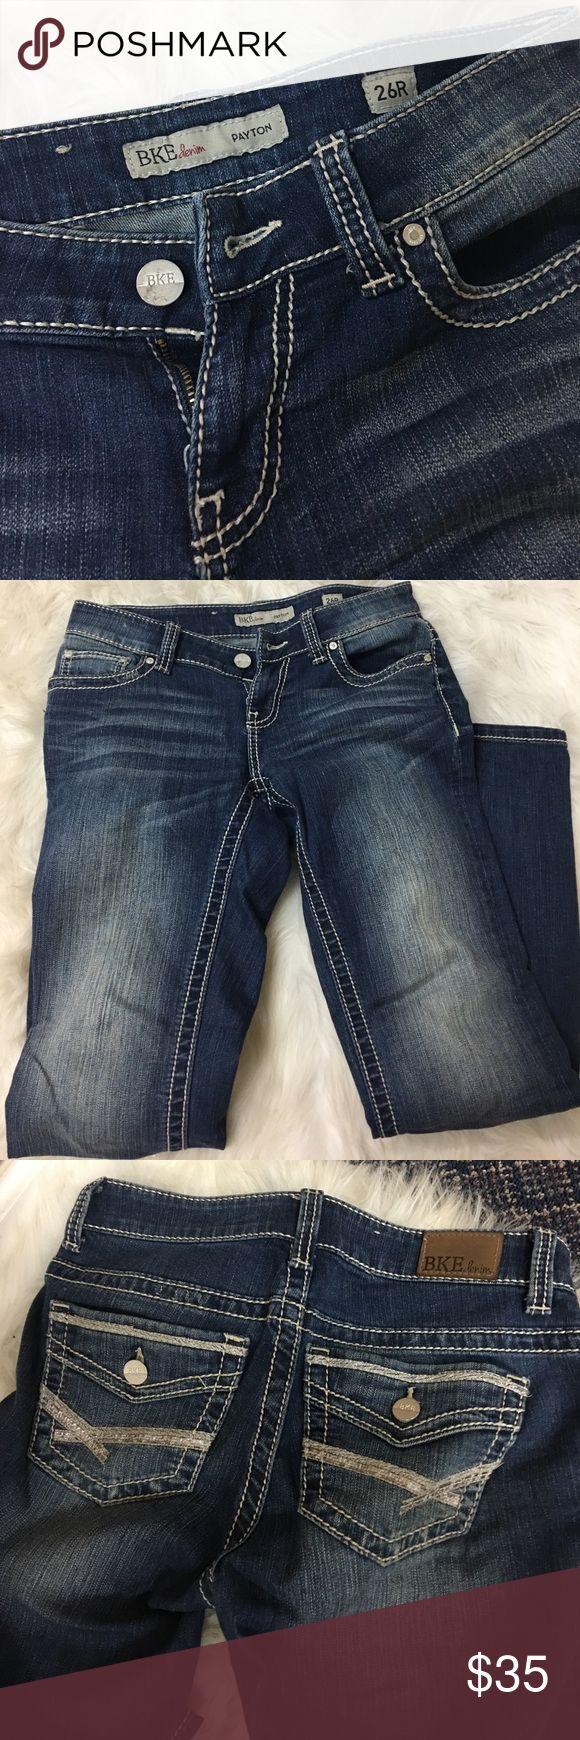 "School sale!! NWOT BKE Payton curvy jeans size 26 NWOT BKE Payton Curvy jeans size 26 inseam 31.5"" BKE Jeans"